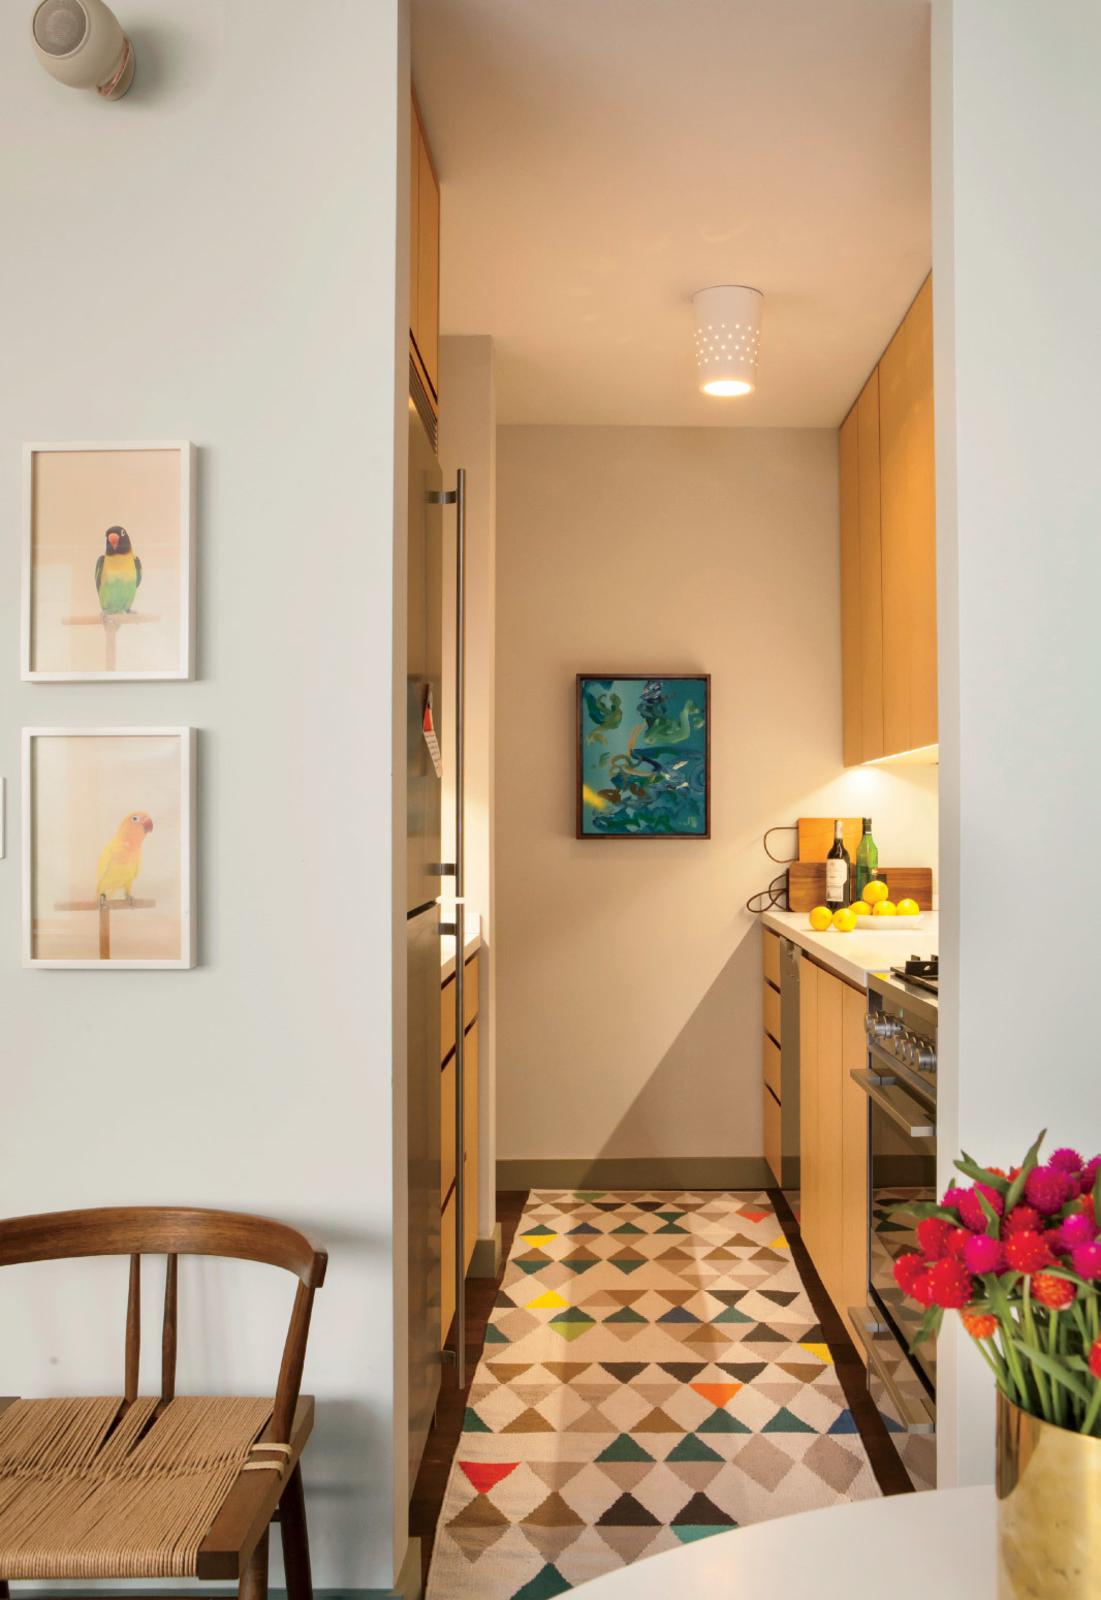 Interiorismo dise o para espacios peque os for Diseno de interiores para espacios pequenos